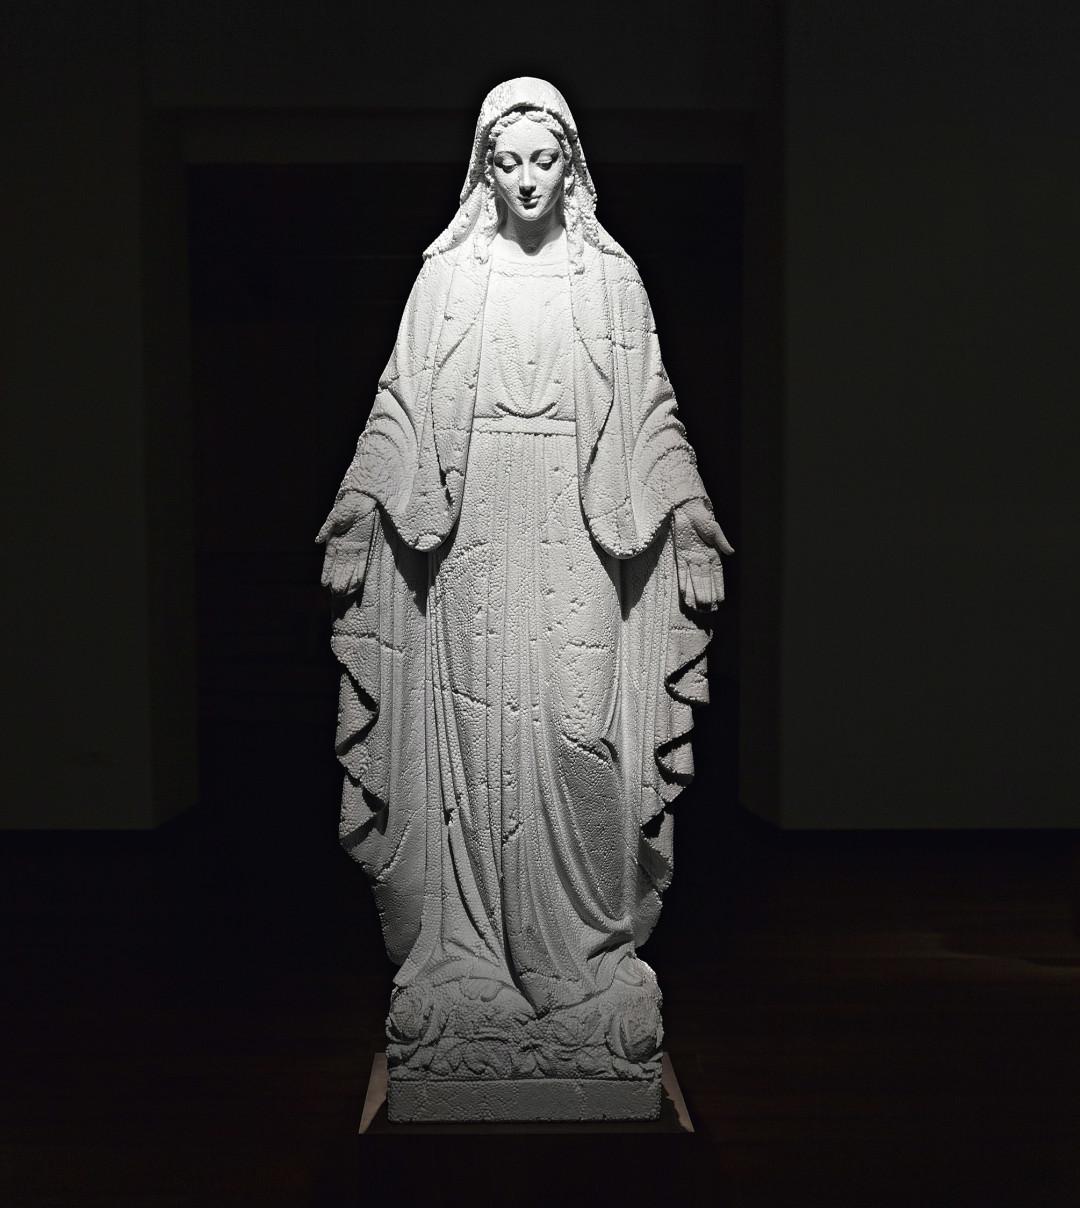 punk fabio viale poggiali forconi marmo marble madonna virgin mary